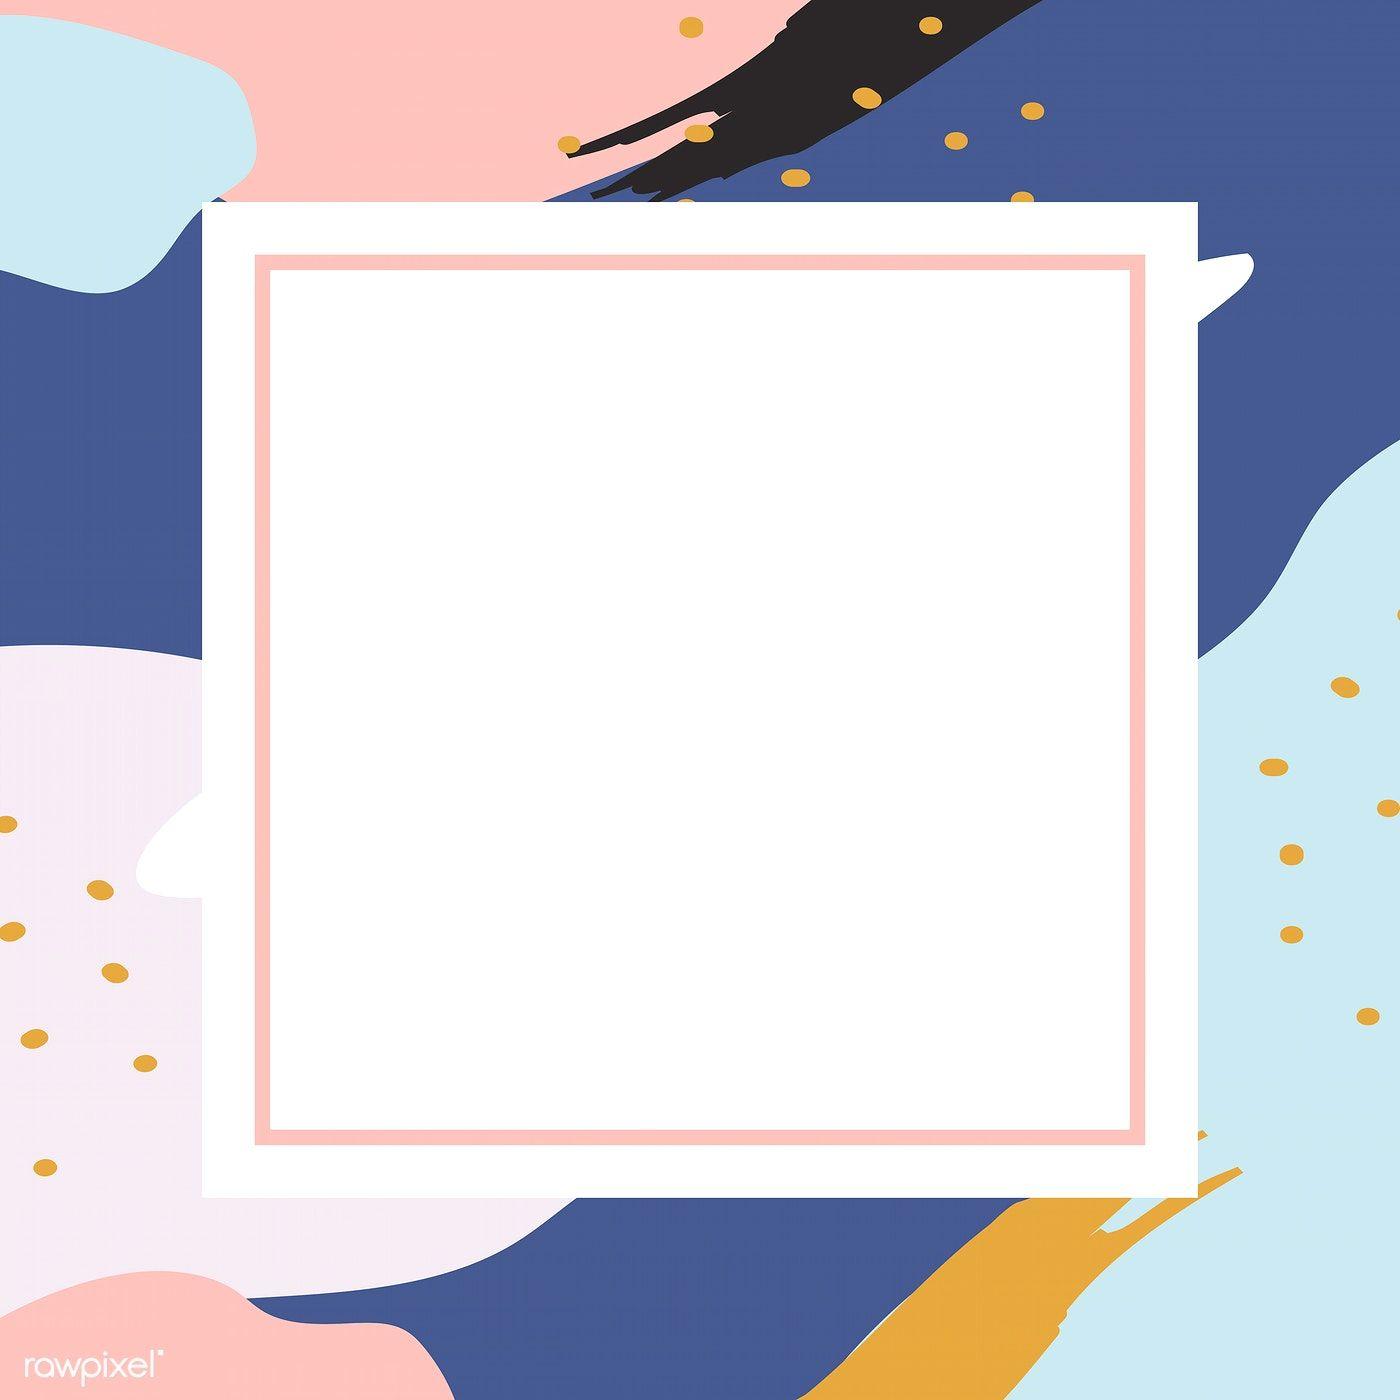 Download Premium Vector Of Blank Square Pastel Memphis Frame